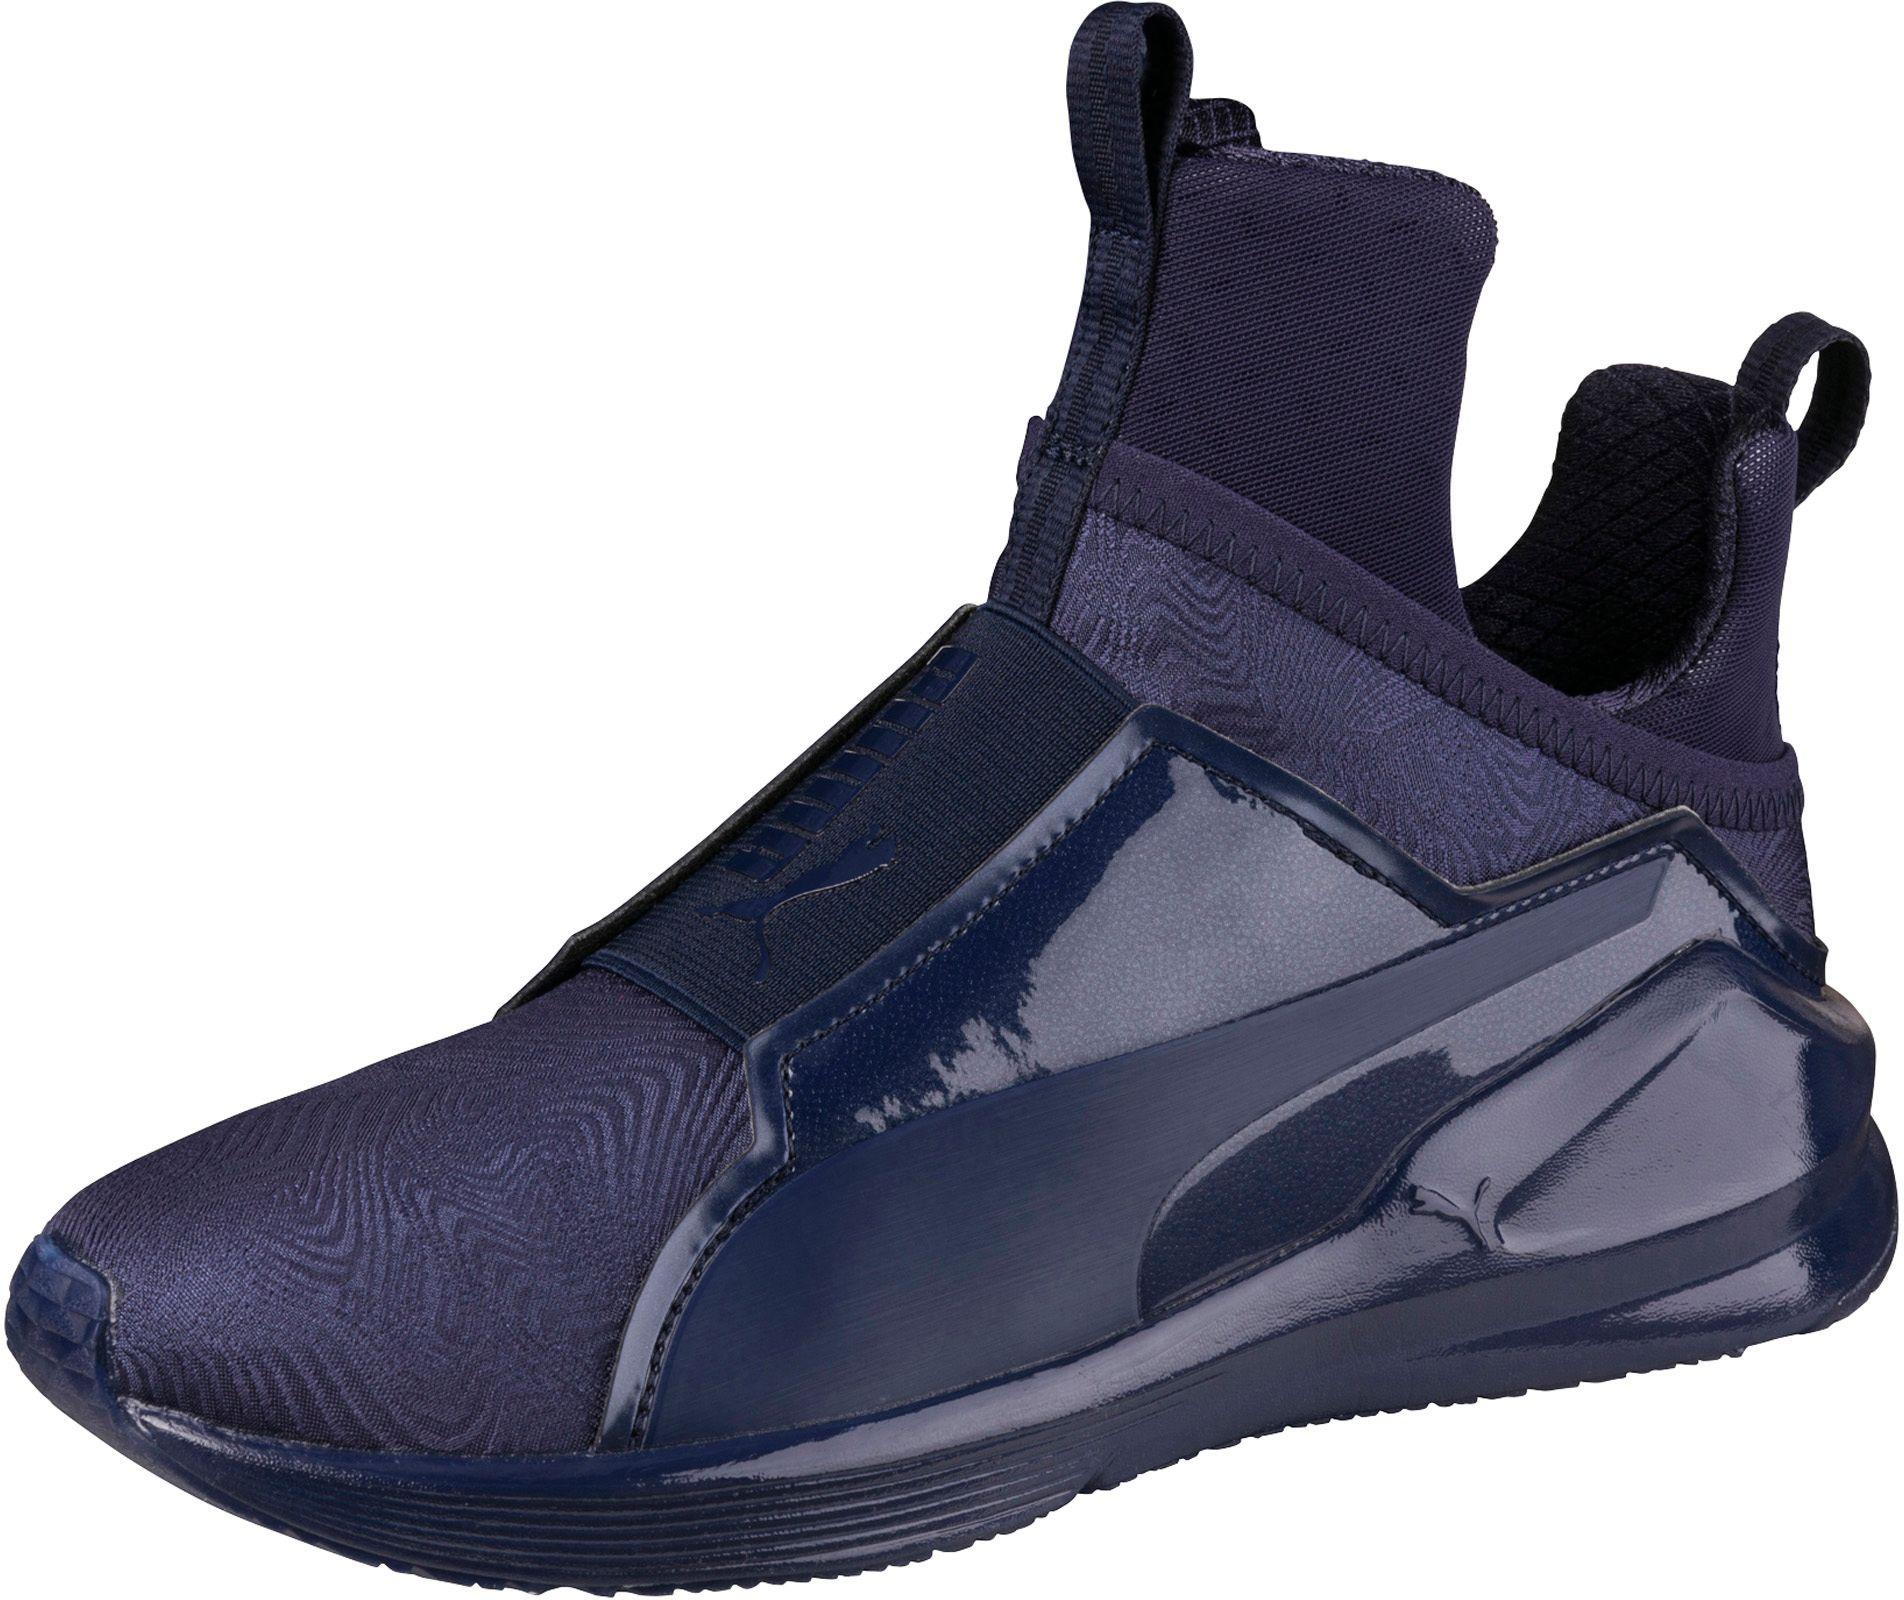 Puma Fierce Bright Women's Casual Shoes Navy